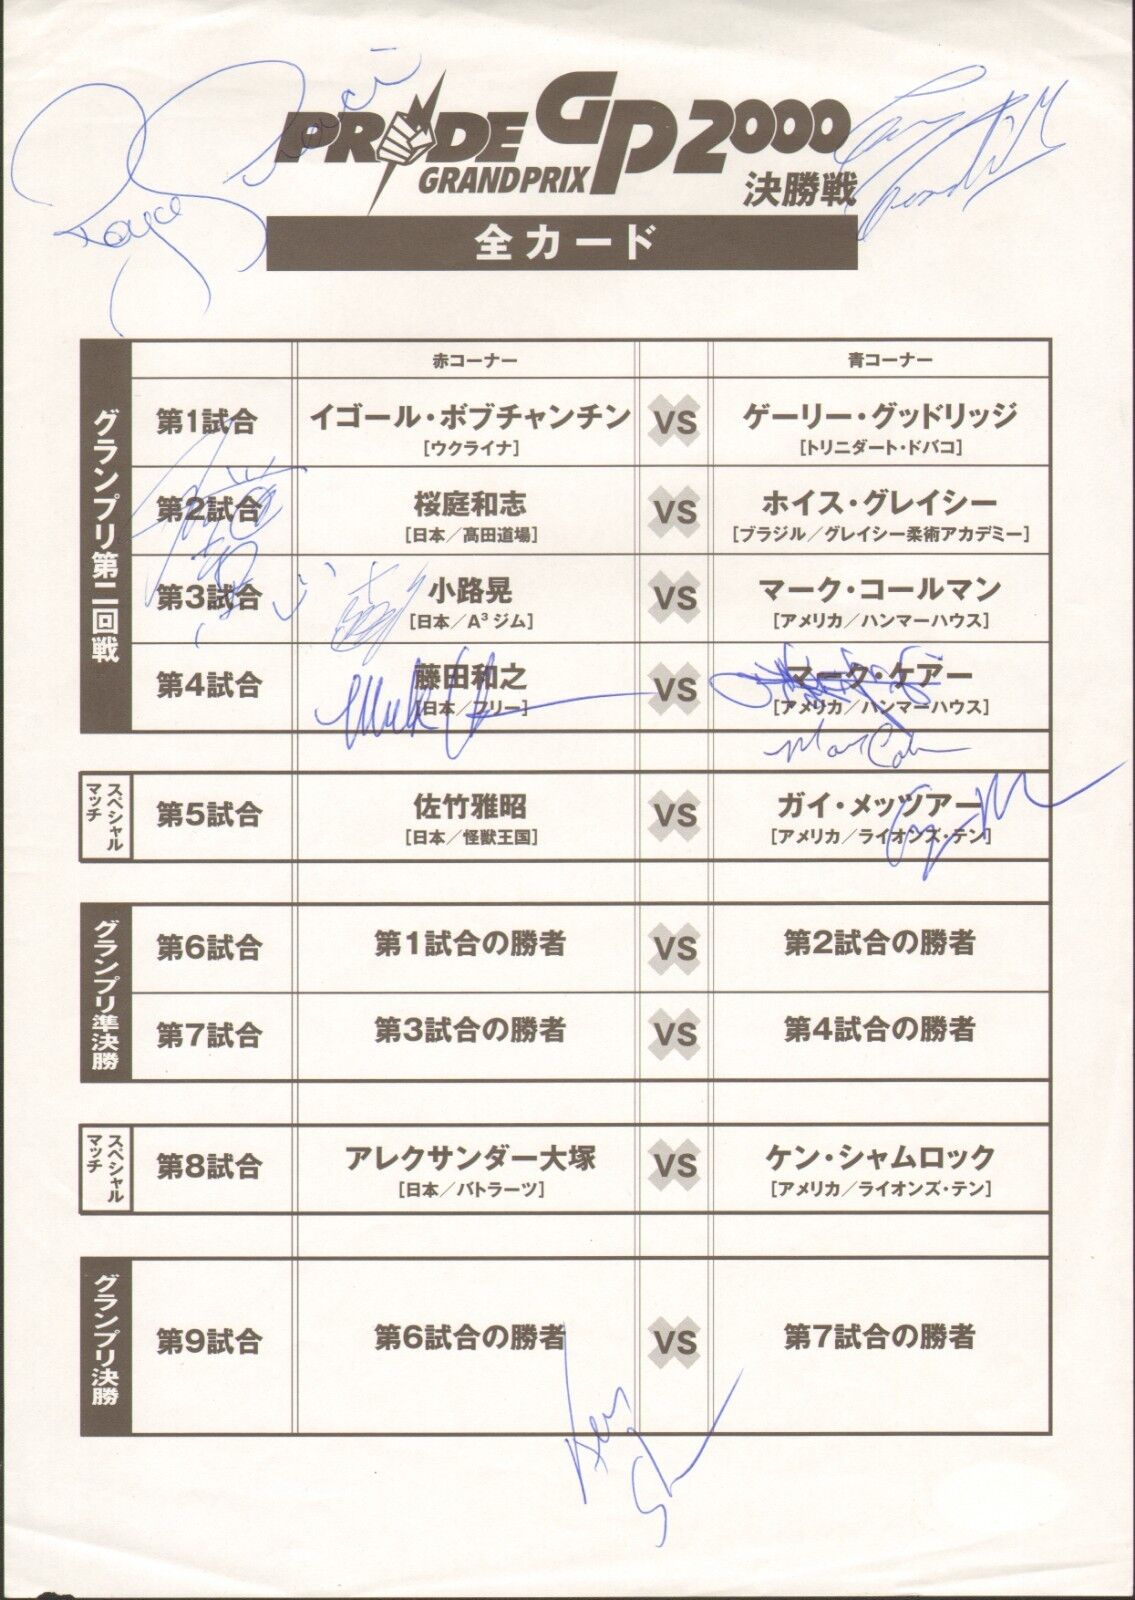 Kazushi Sakuraba Royce Gracie + 7 Firmado Pride 2000 Gp Final rougeondo Insertar